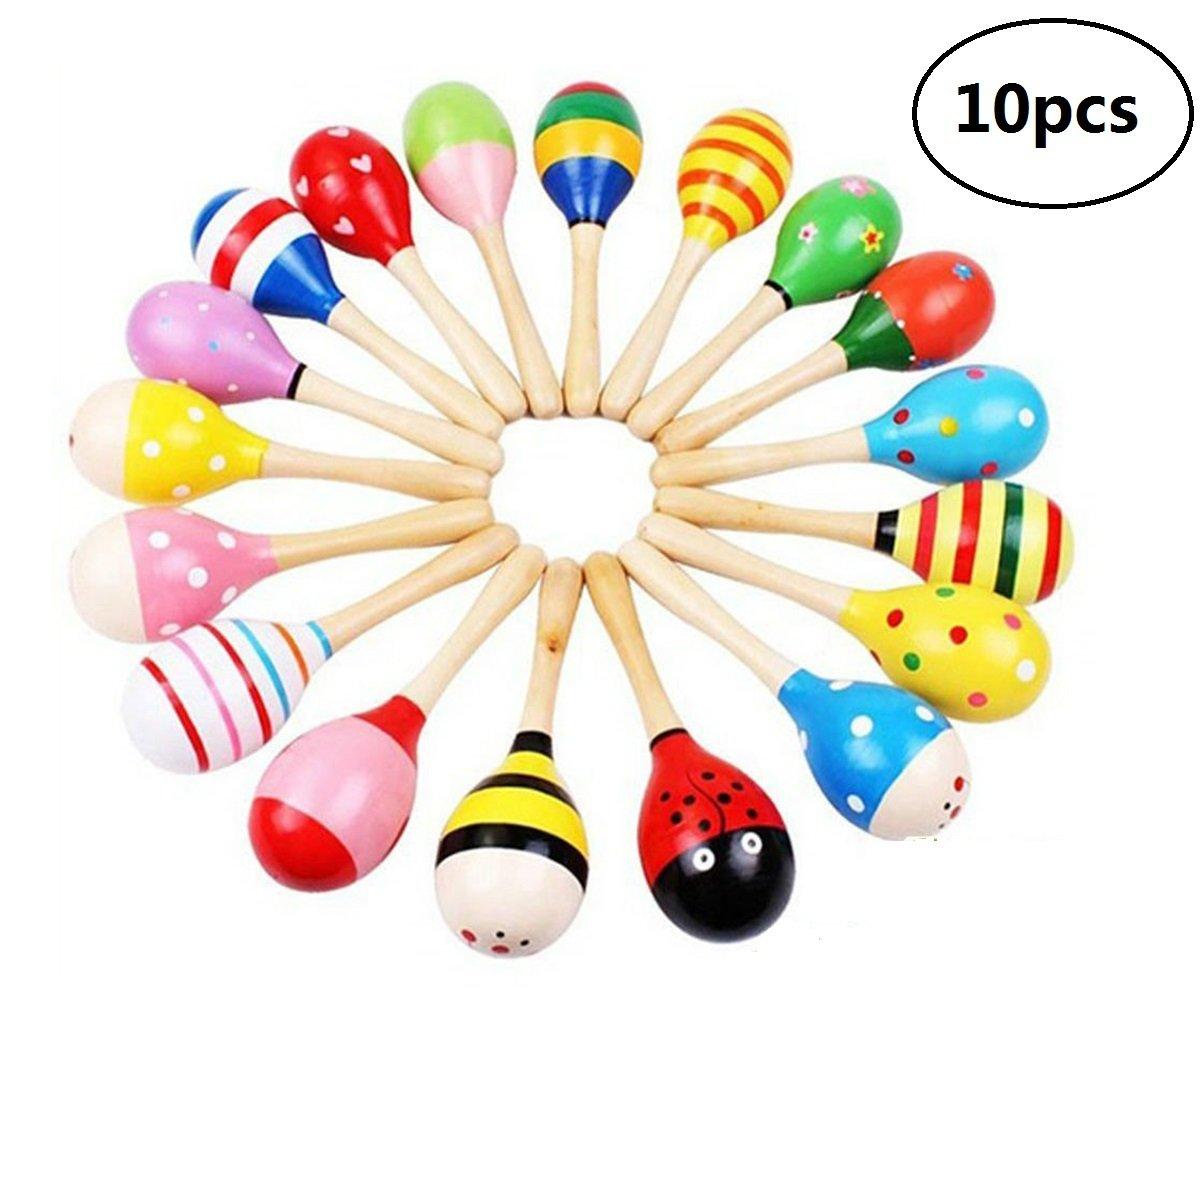 EBTOYS Wooden Maraca Wood Rattles Egg Shaker Kids Musical Educational Toys Party Favor 10 Pack (Random Color Pattern)